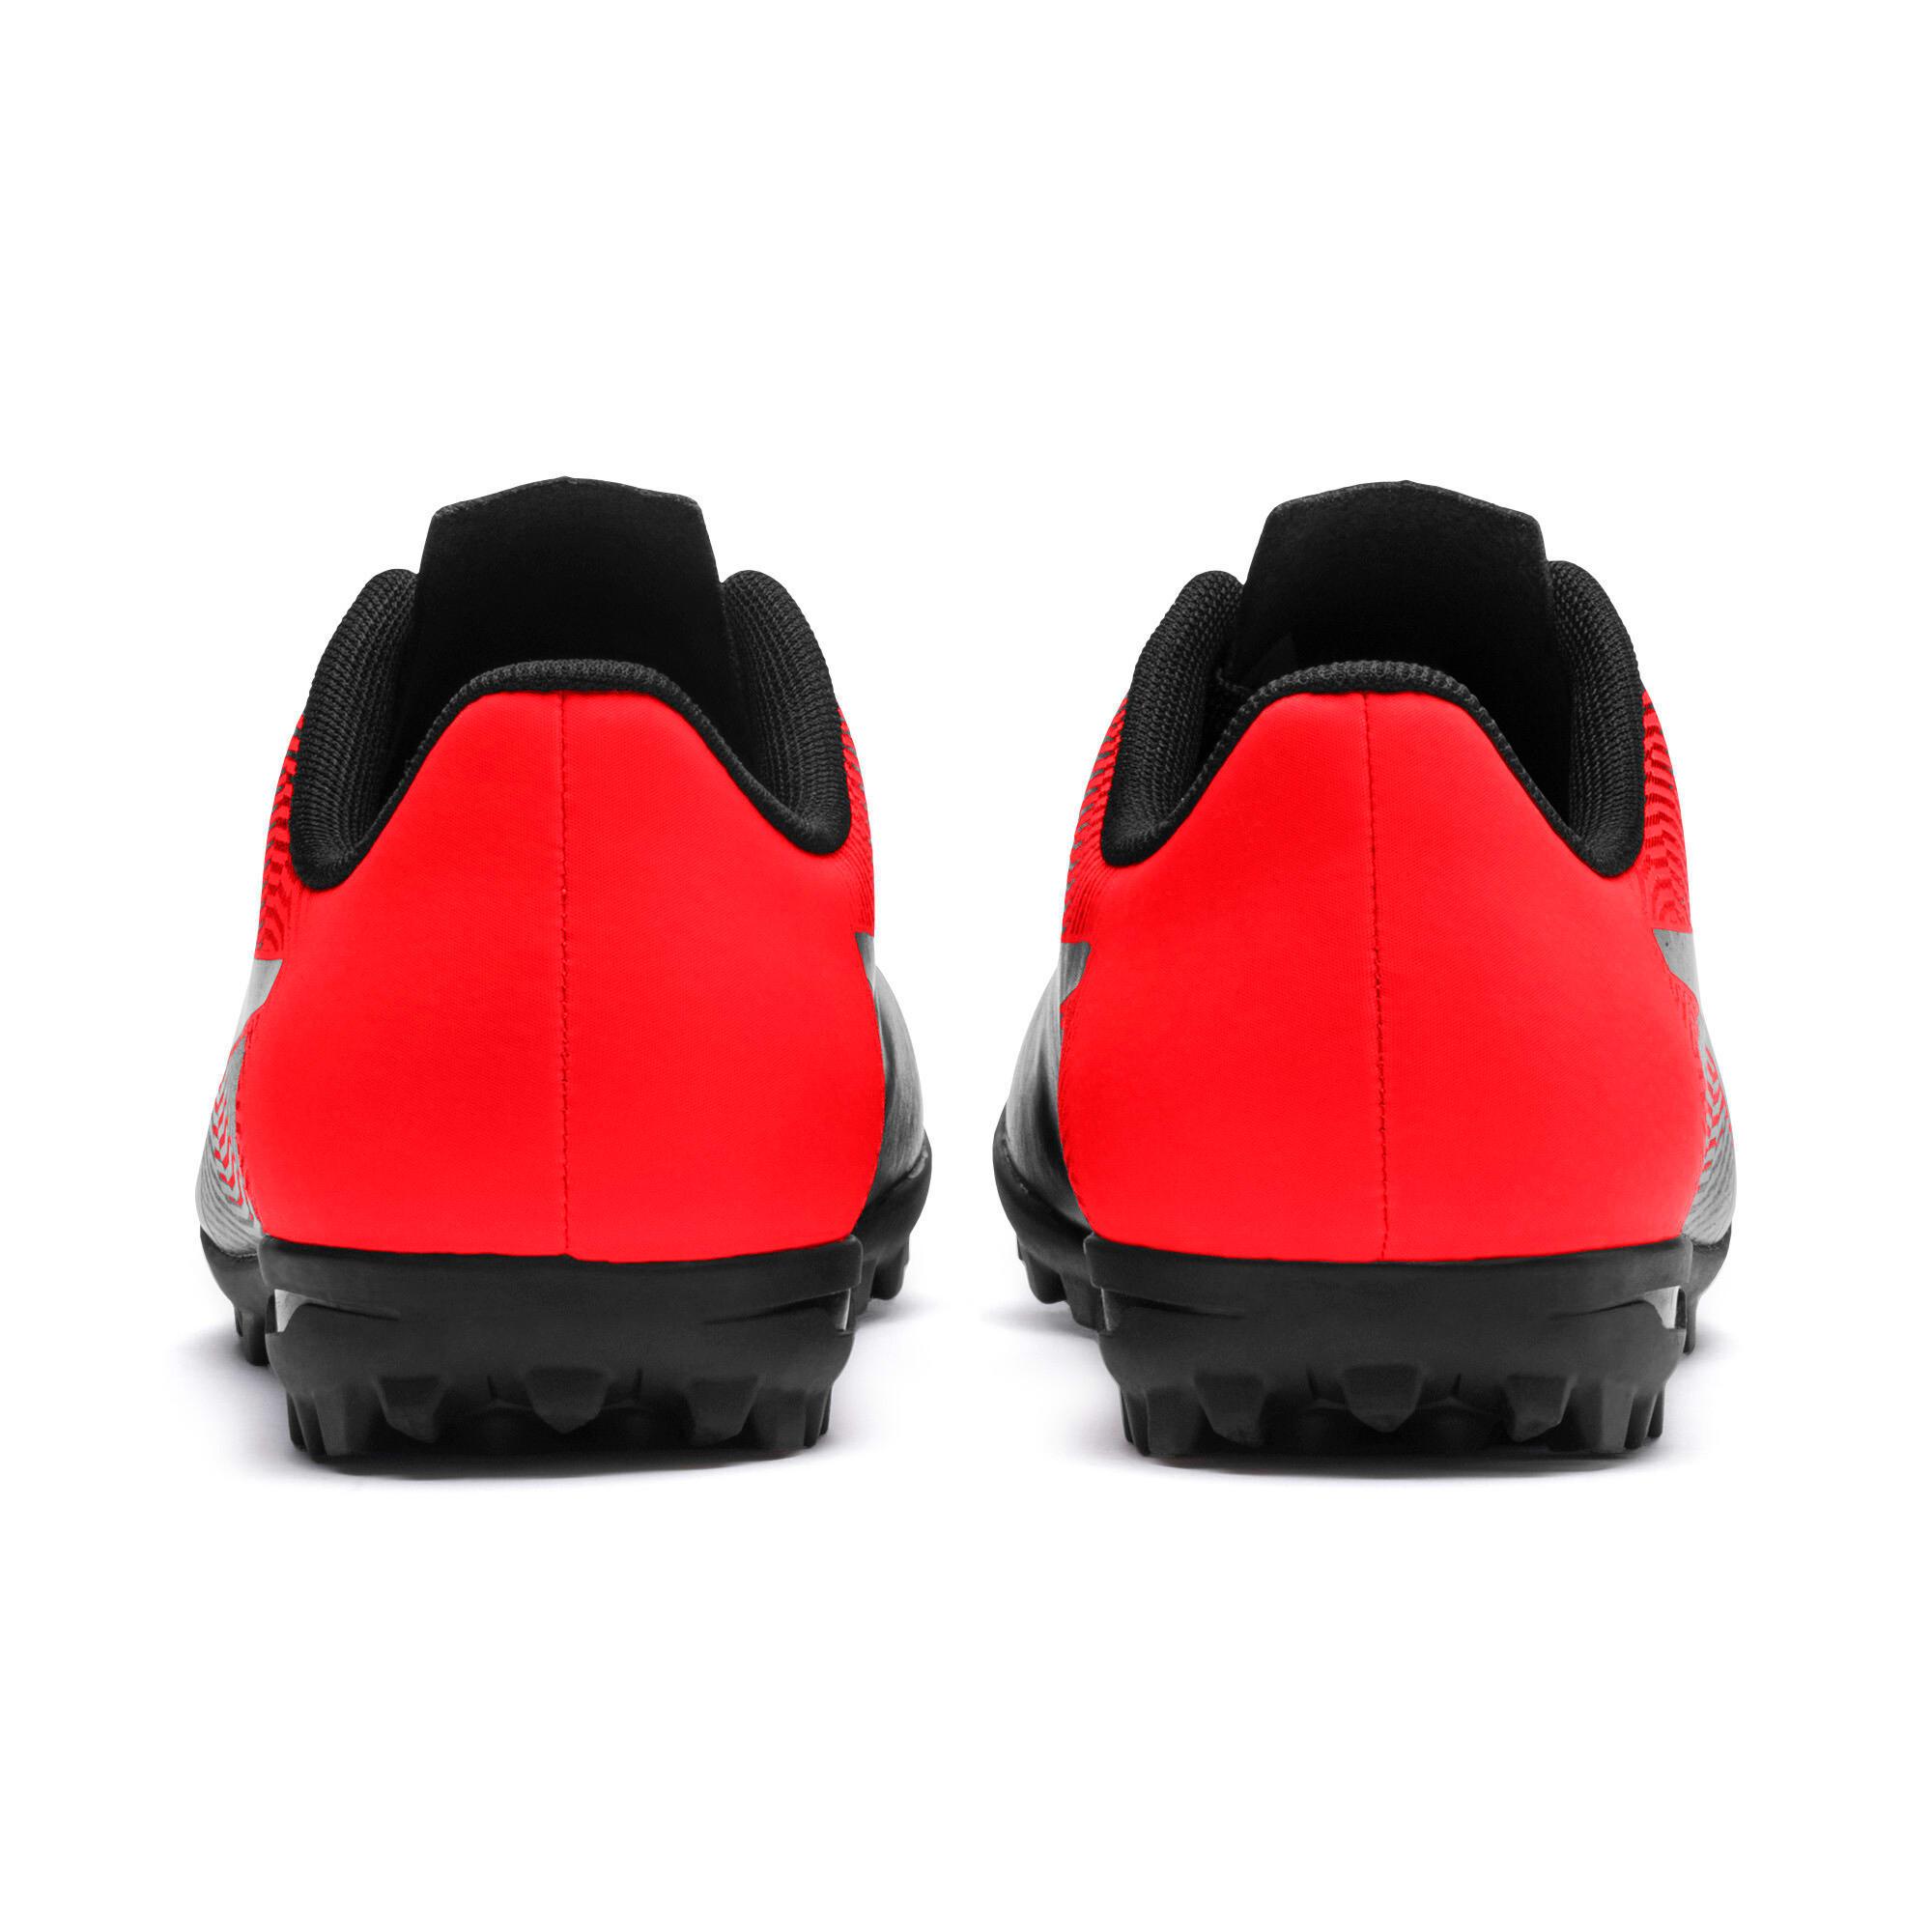 Miniatura 4 de Zapatos de fútbolPUMA Spirit II TT para JR, Puma Black-Red Blast, mediano